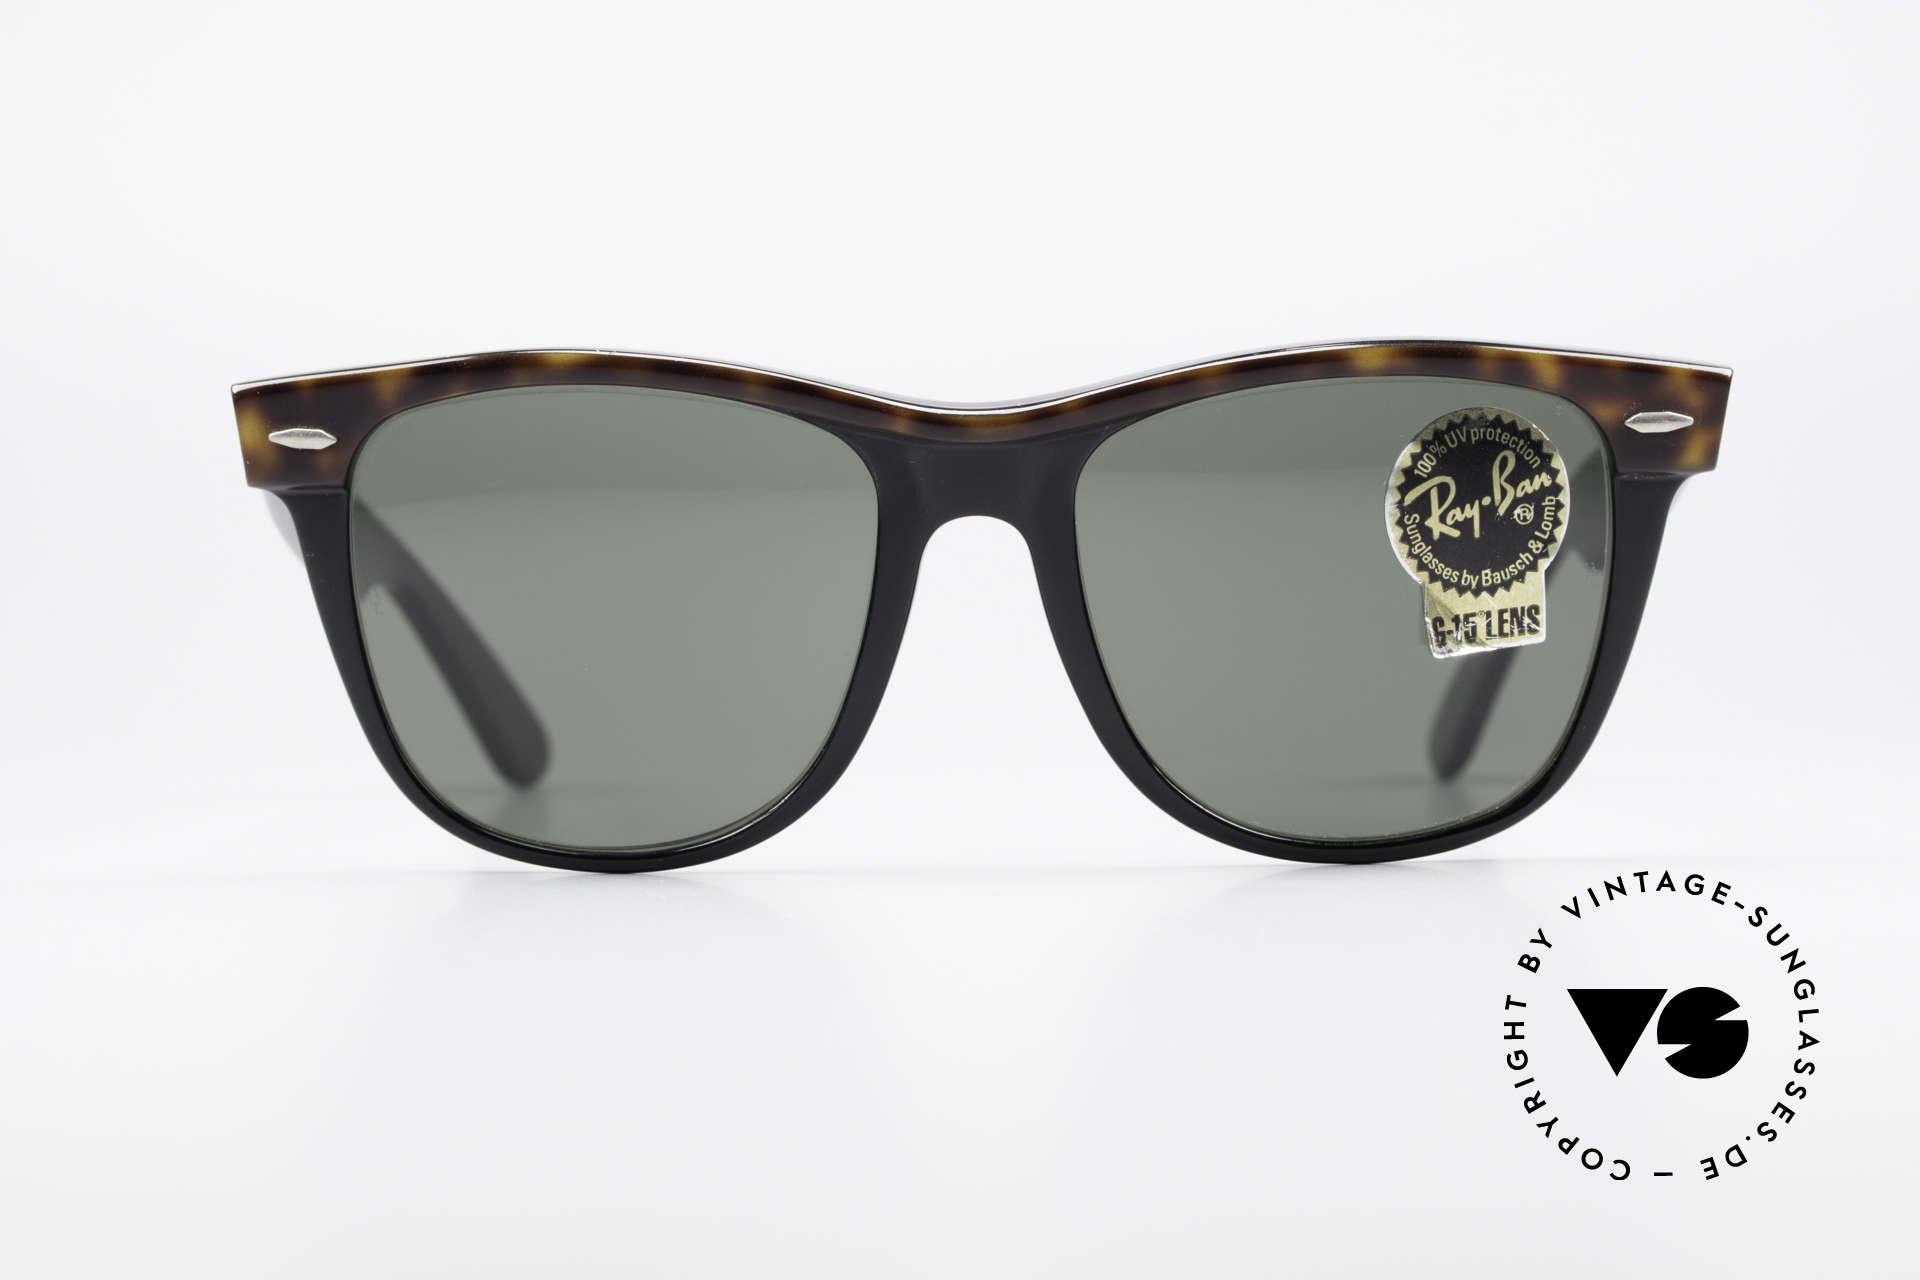 91ba5c0fc Sunglasses Ray Ban Wayfarer II Original 80's Wayfarer USA   Vintage ...